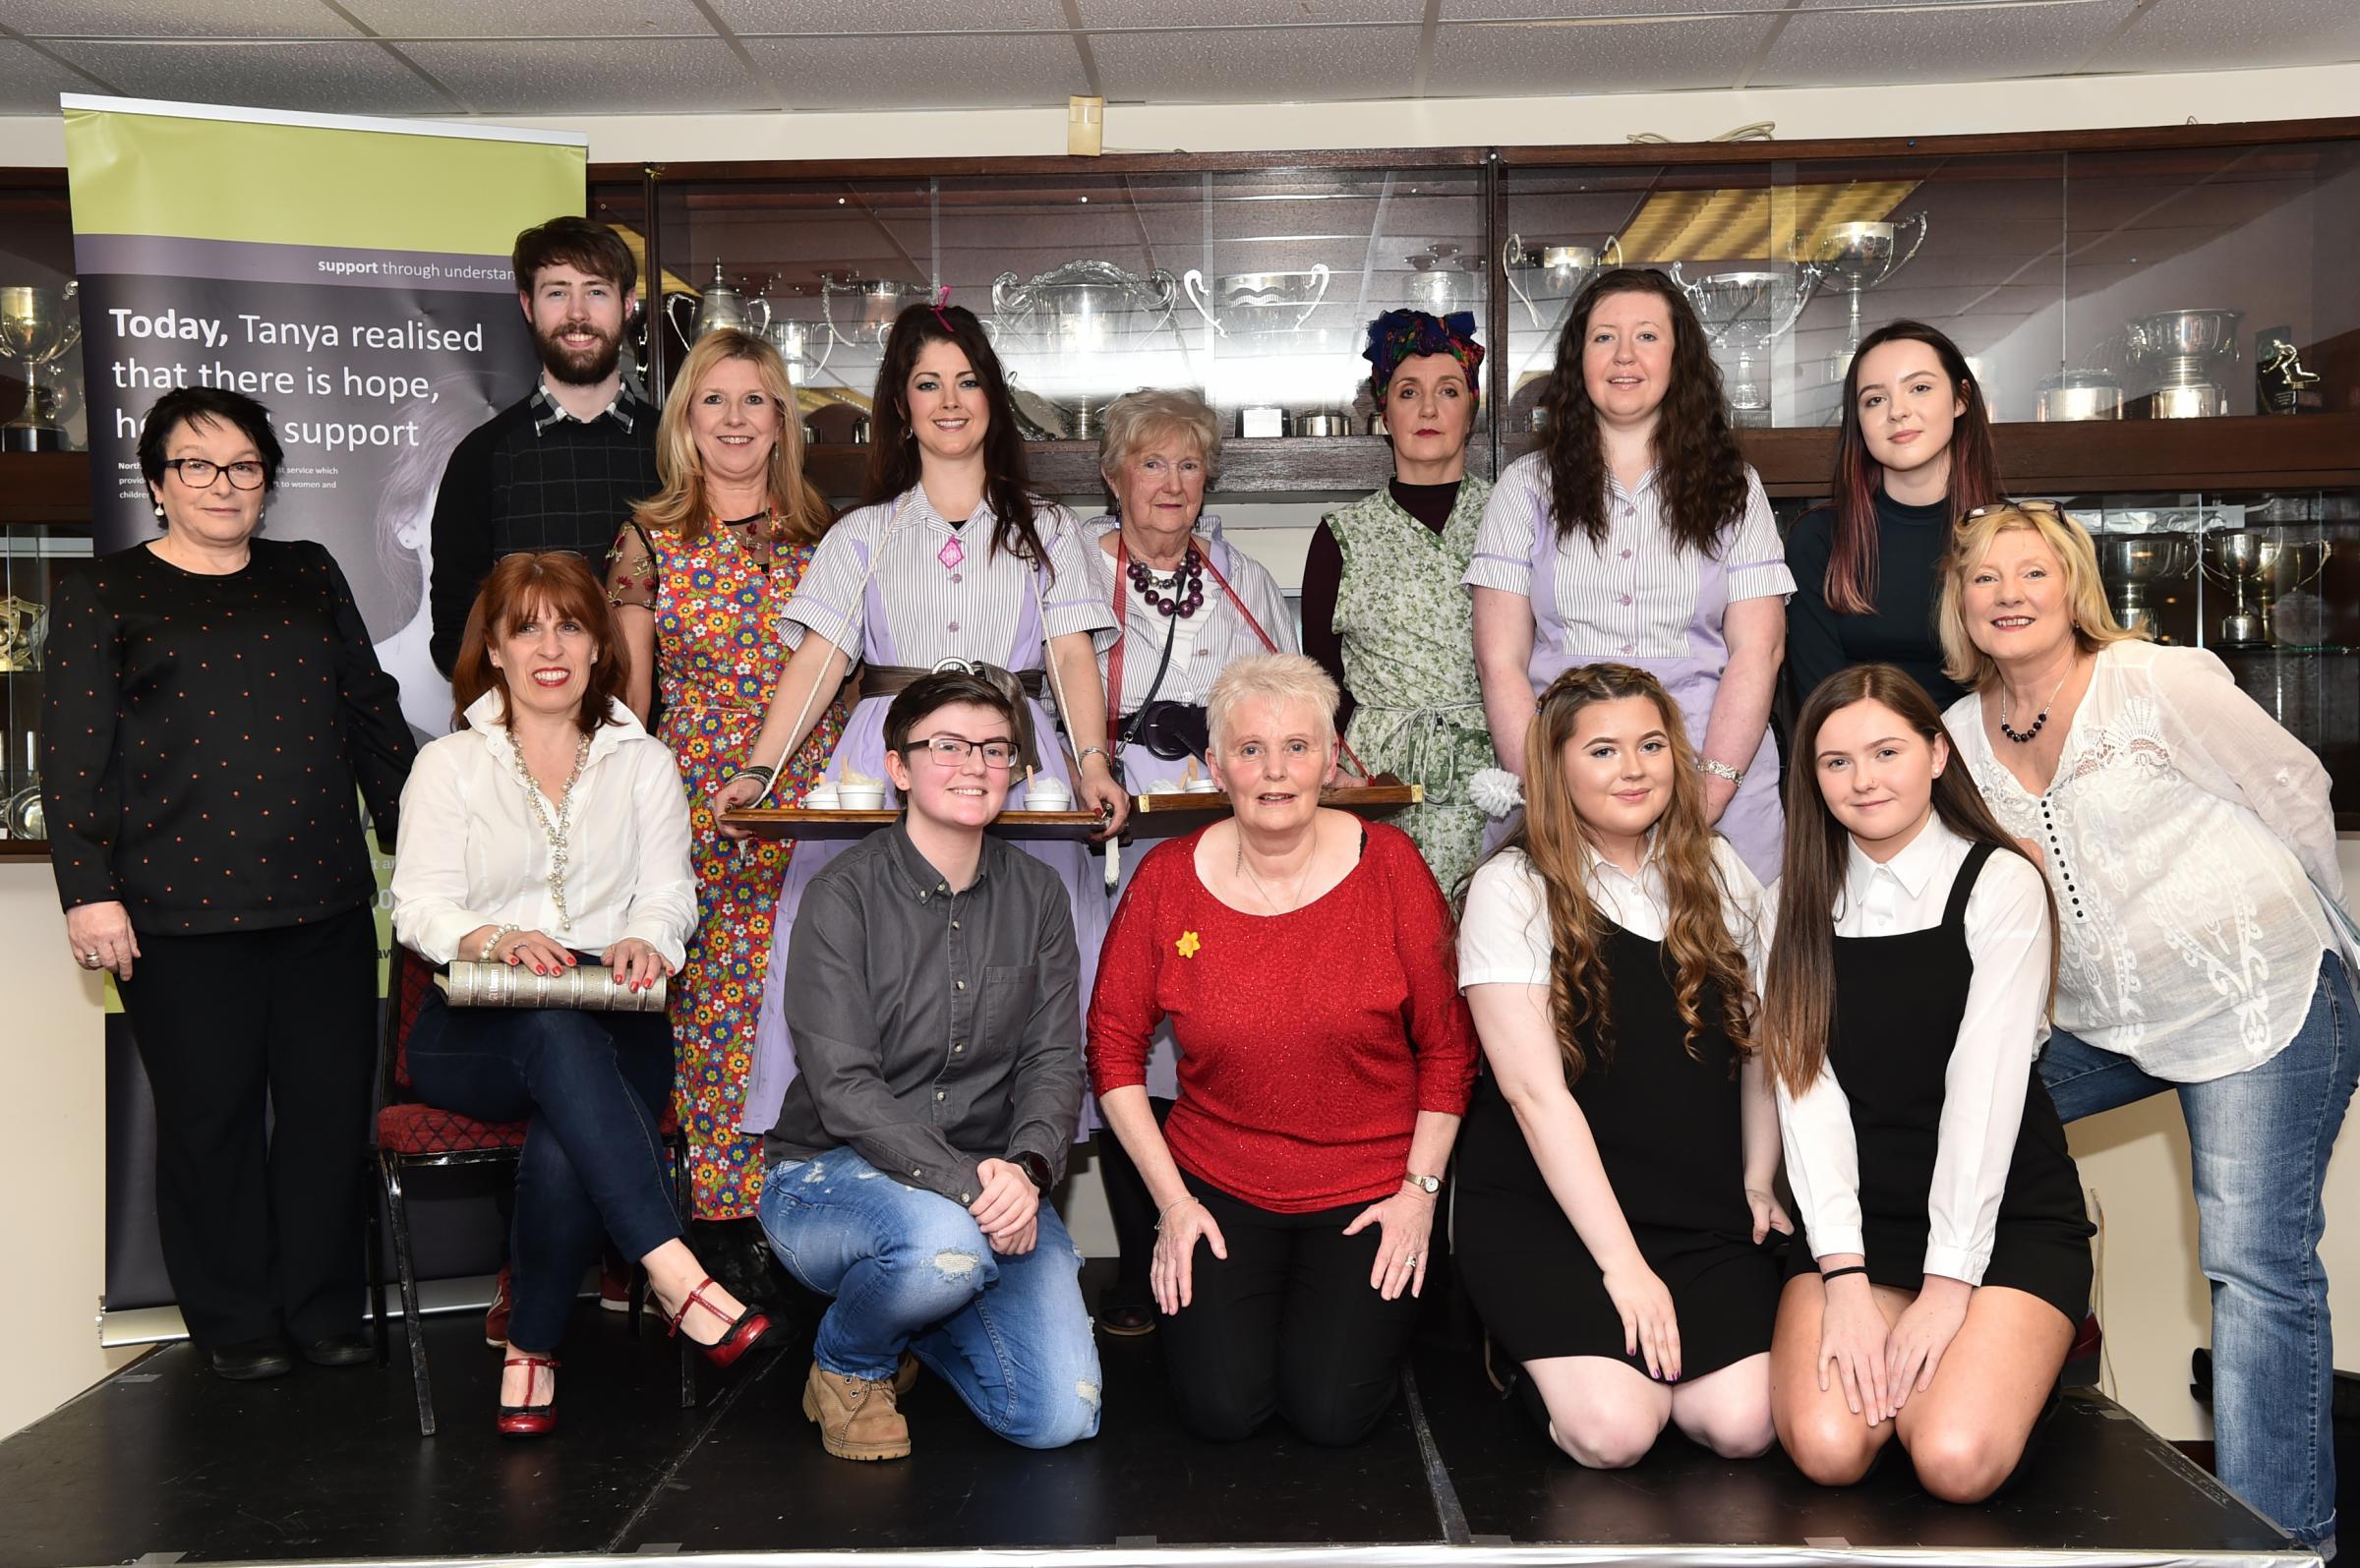 Ardrossan's 'Lassies Giein it Laldy' raises £535 for Women's Aid